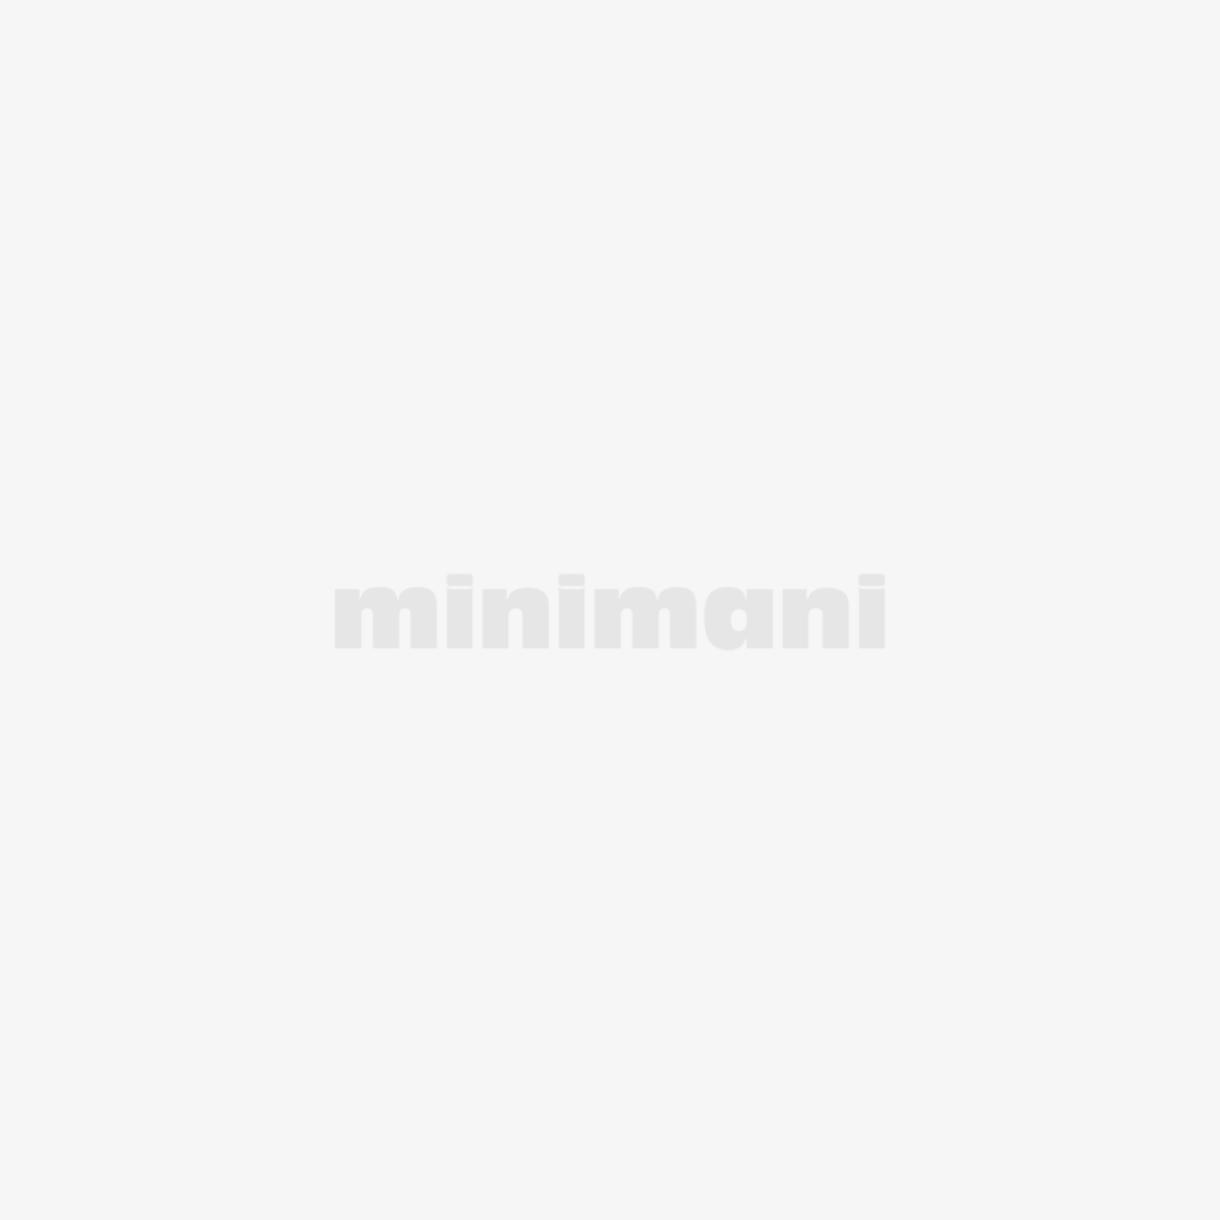 BRAUN BRAUN LADYSHAVER SILK&SOFT LS5160